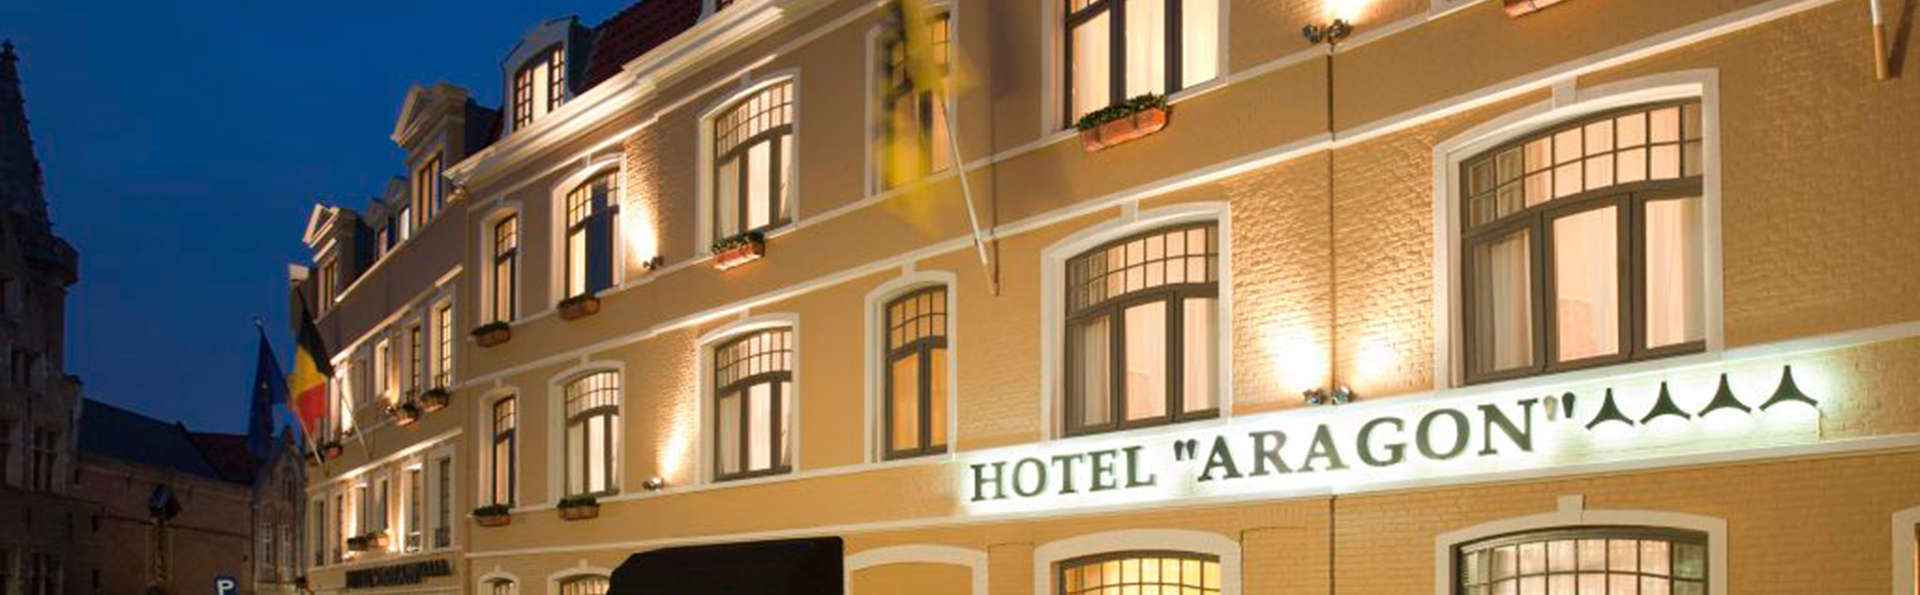 Hotel Aragon - EDIT_front.jpg